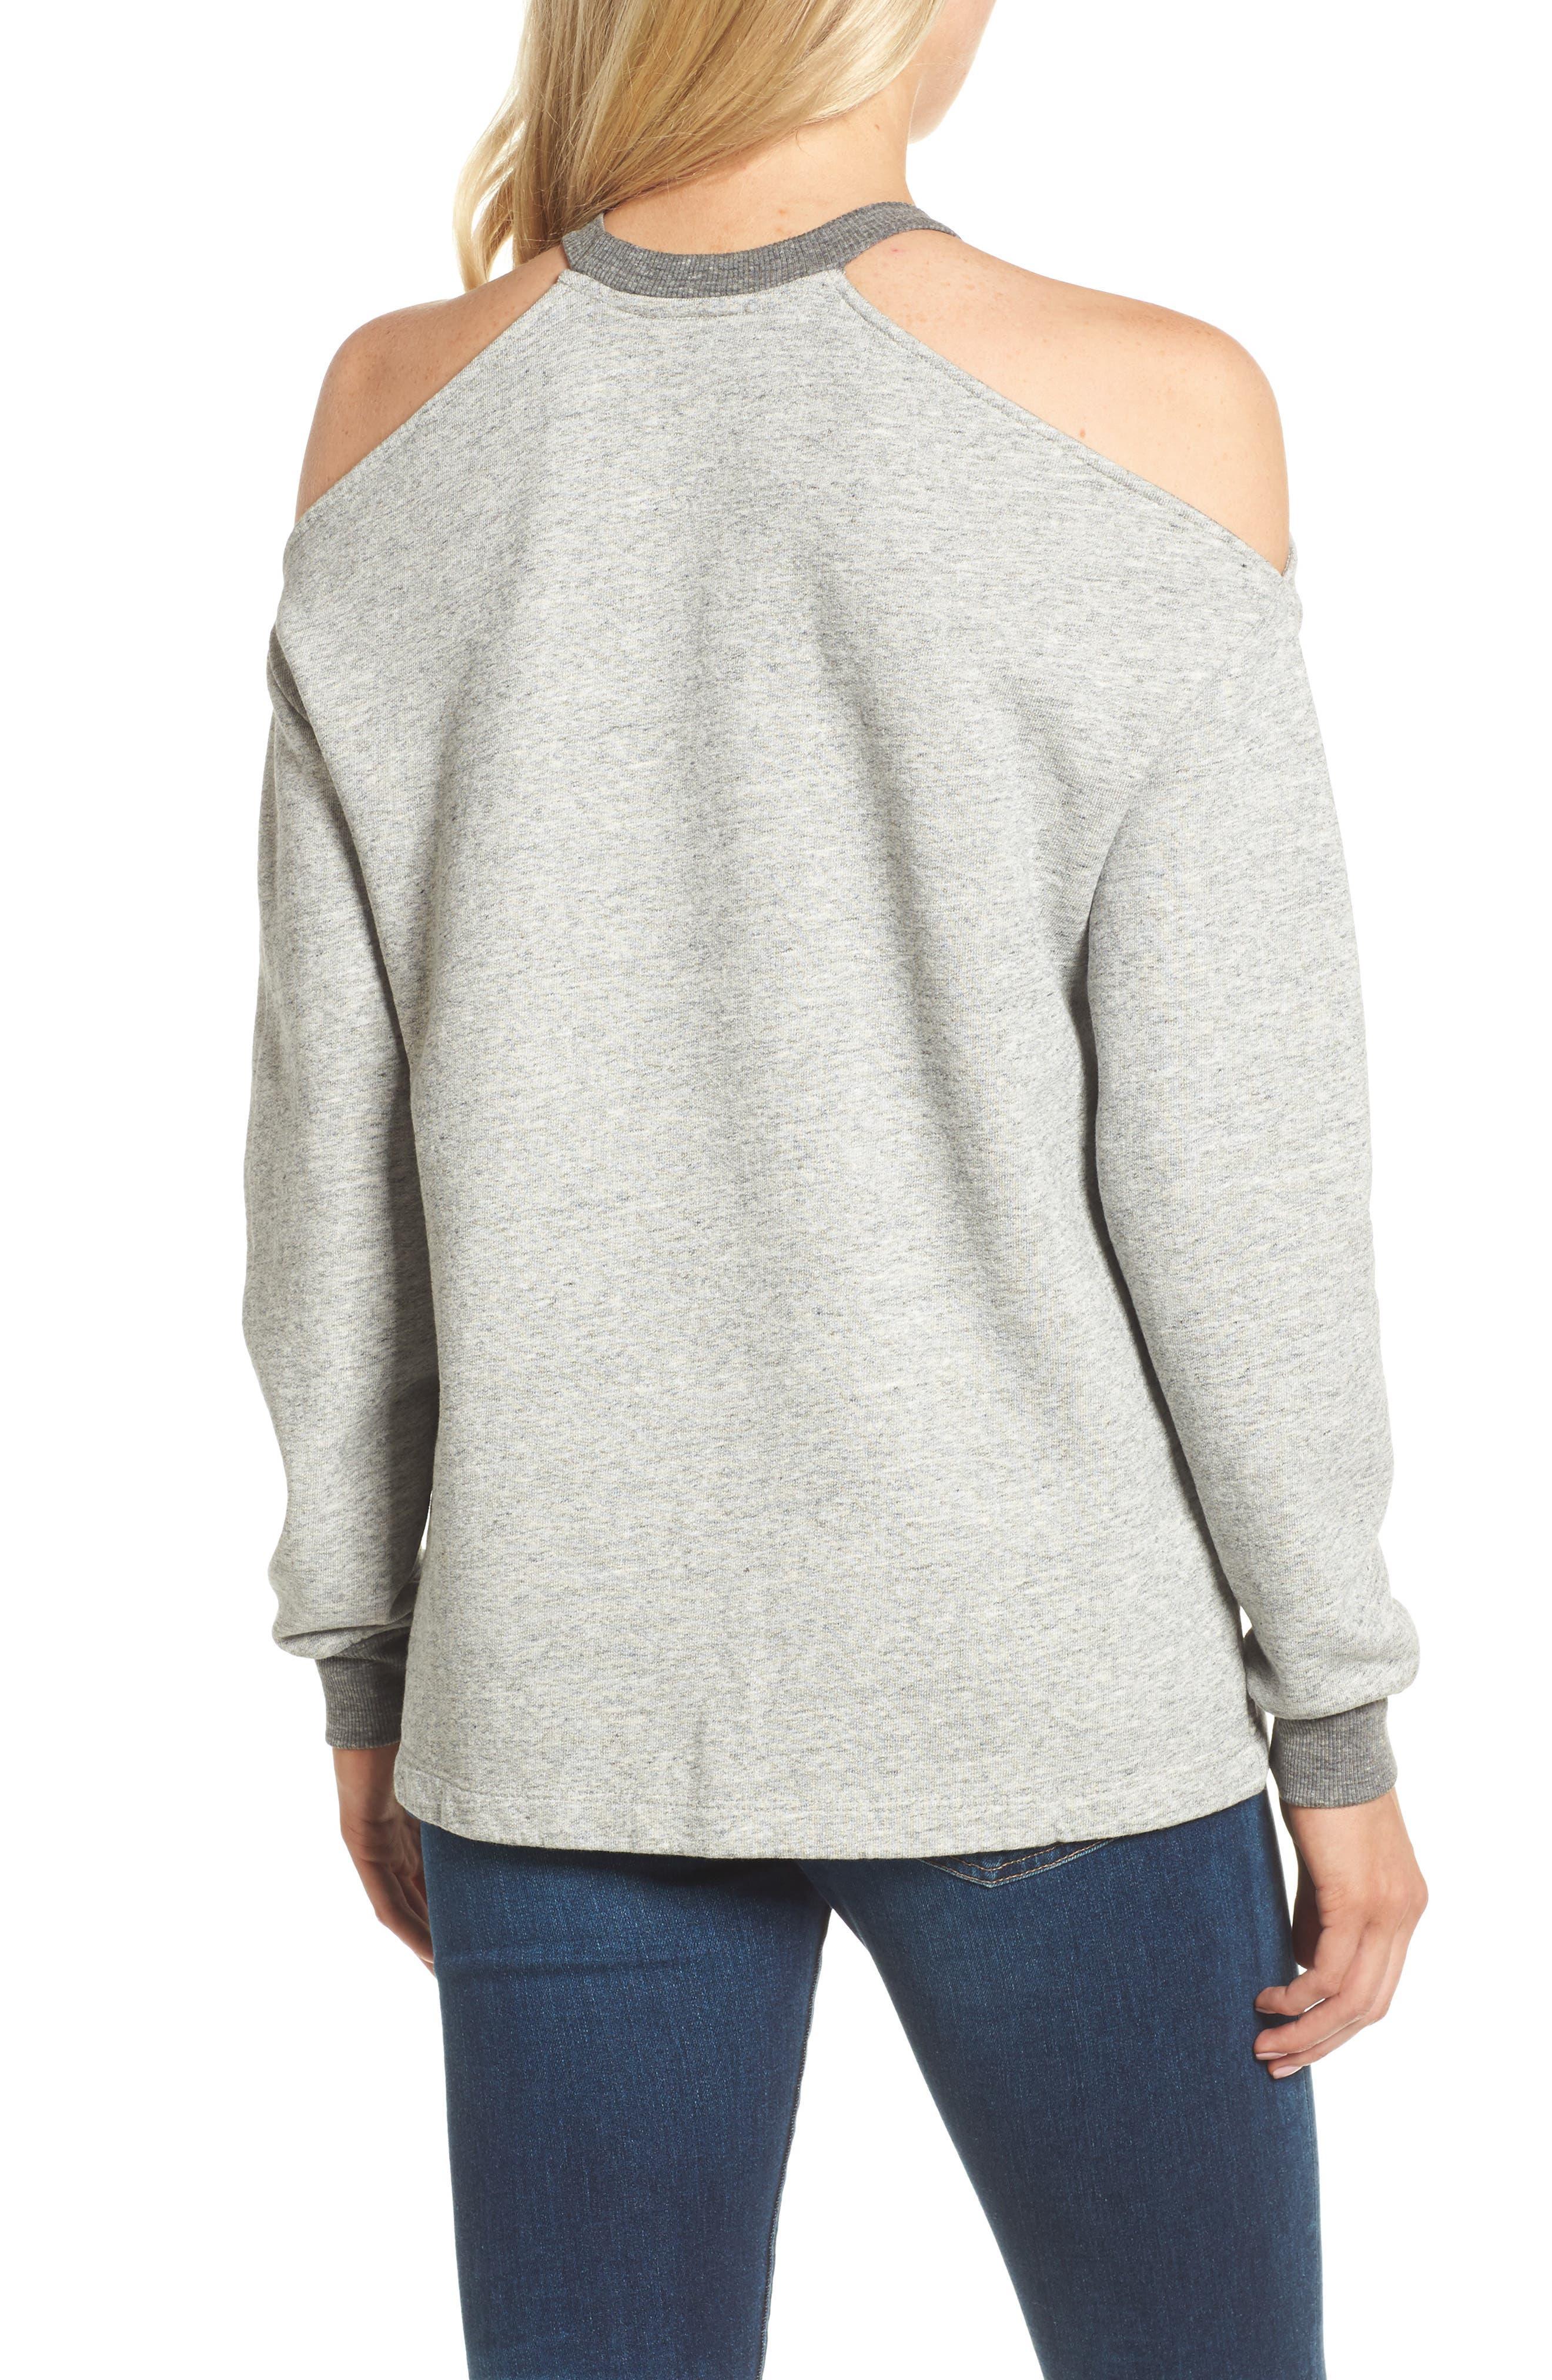 Gizi Cold Shoulder Sweatshirt,                             Alternate thumbnail 2, color,                             022